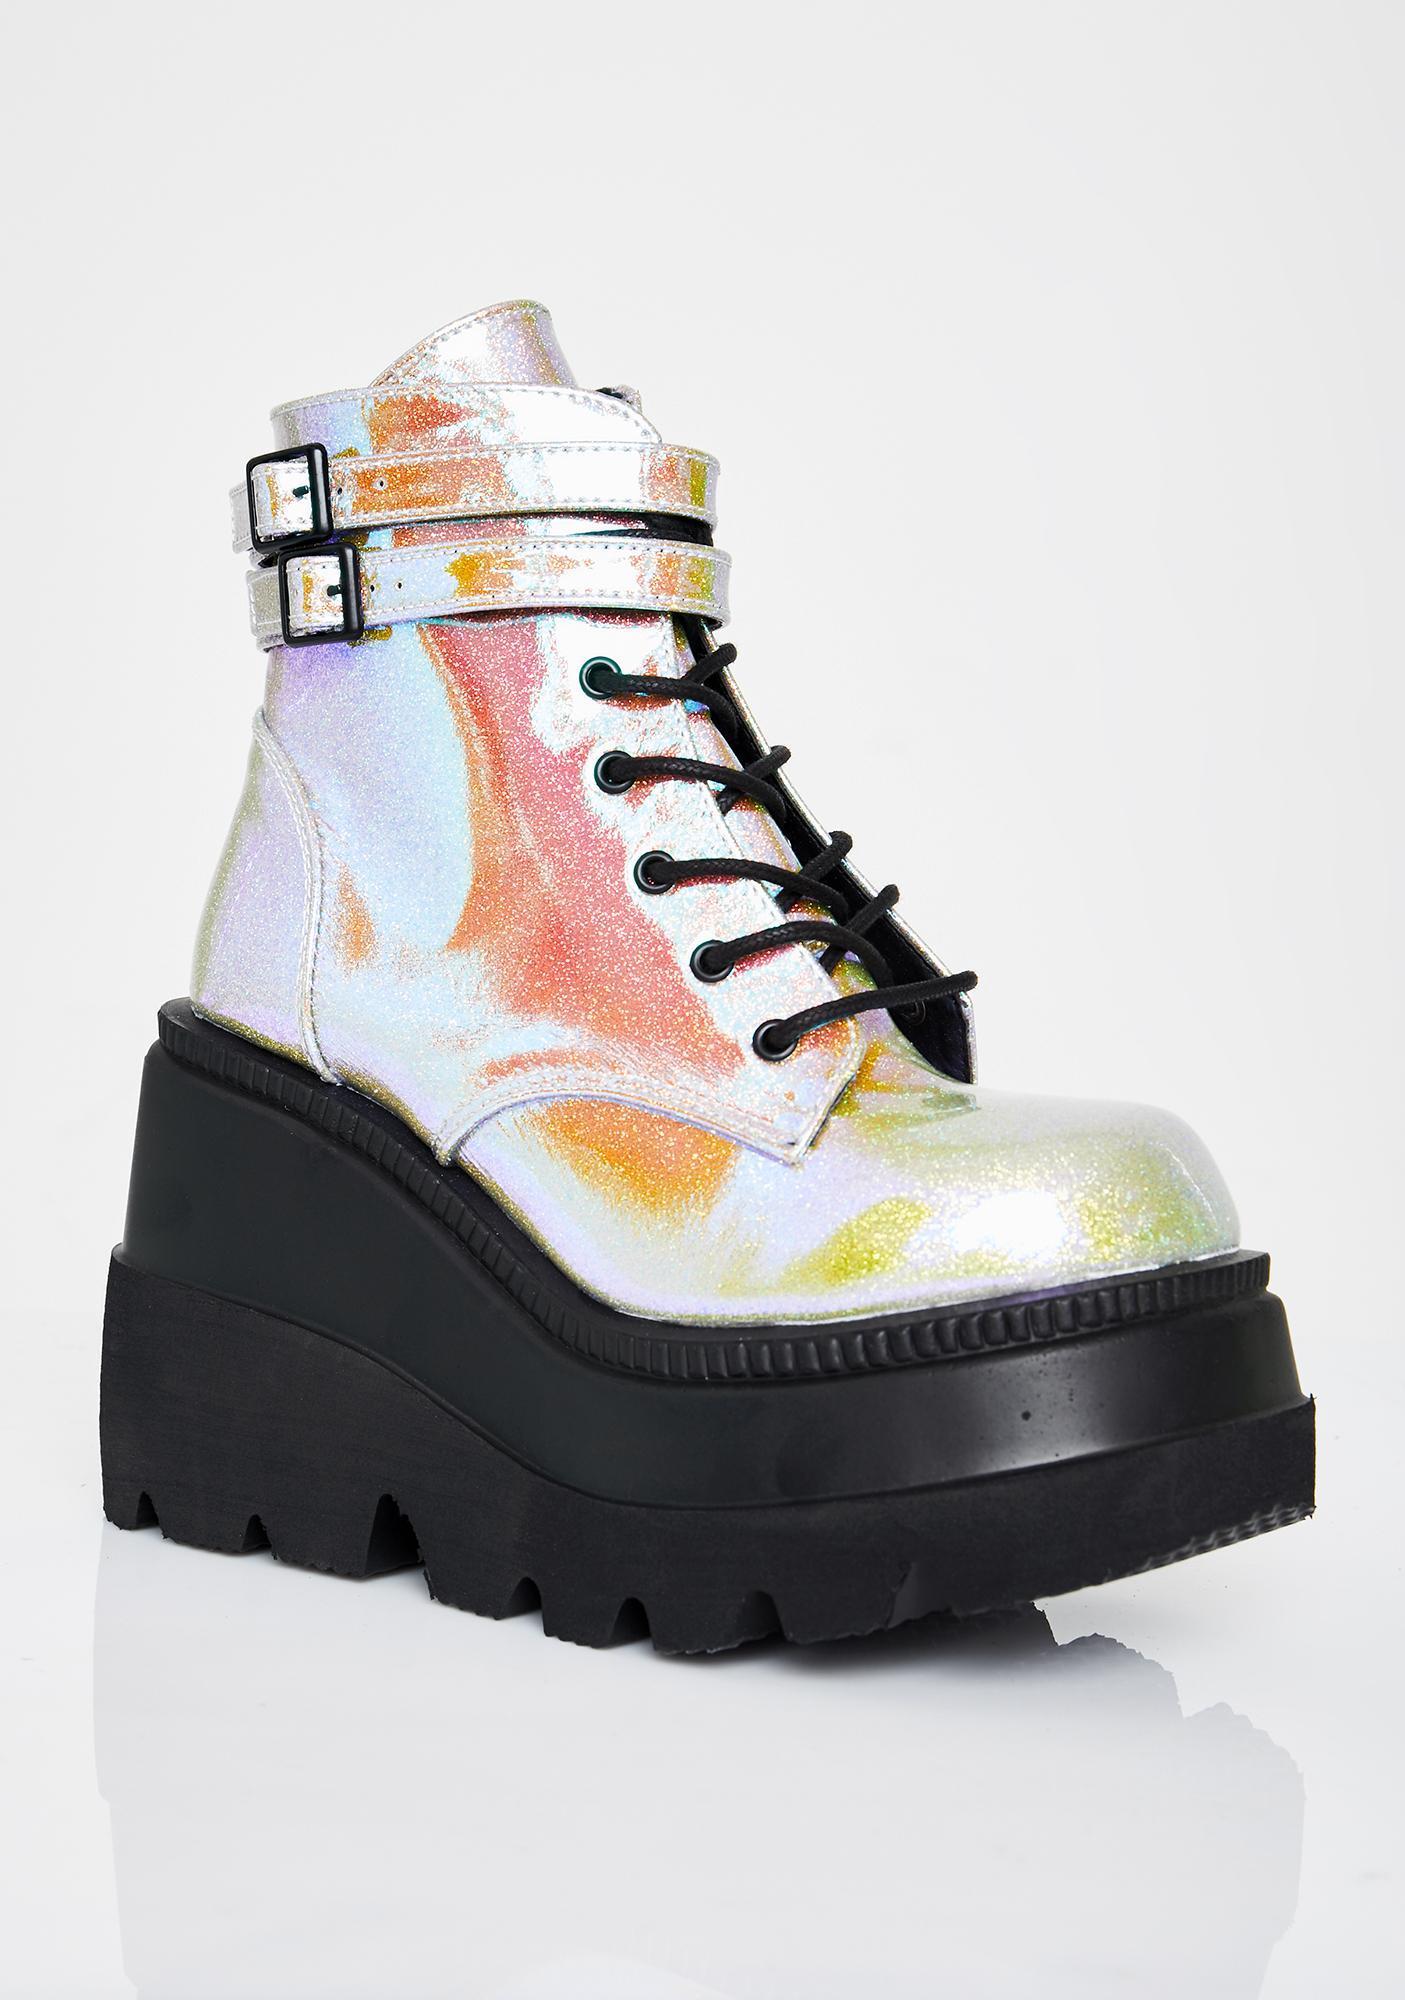 Demonia Acid Technopagan Boots